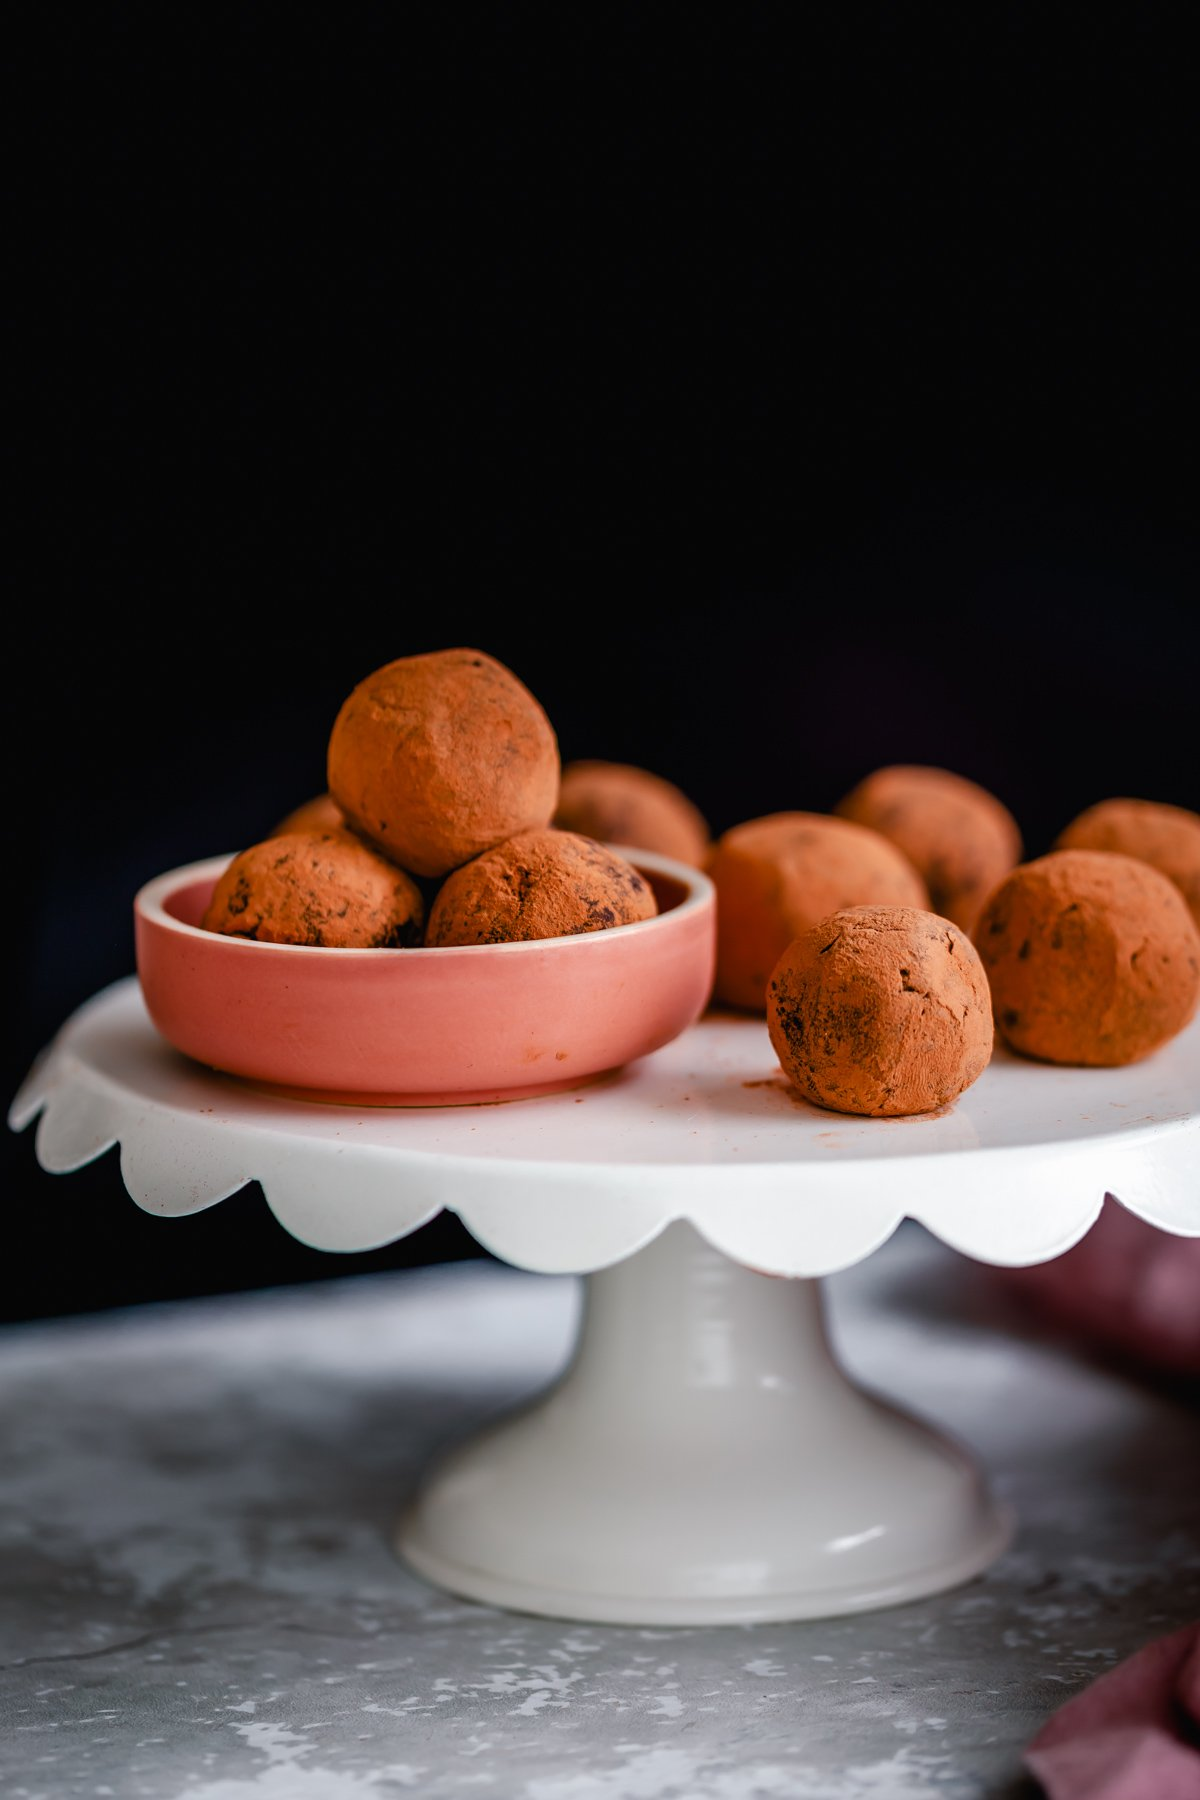 vegan tiramisu truffles rolled in cocoa powder presented on a cake stand